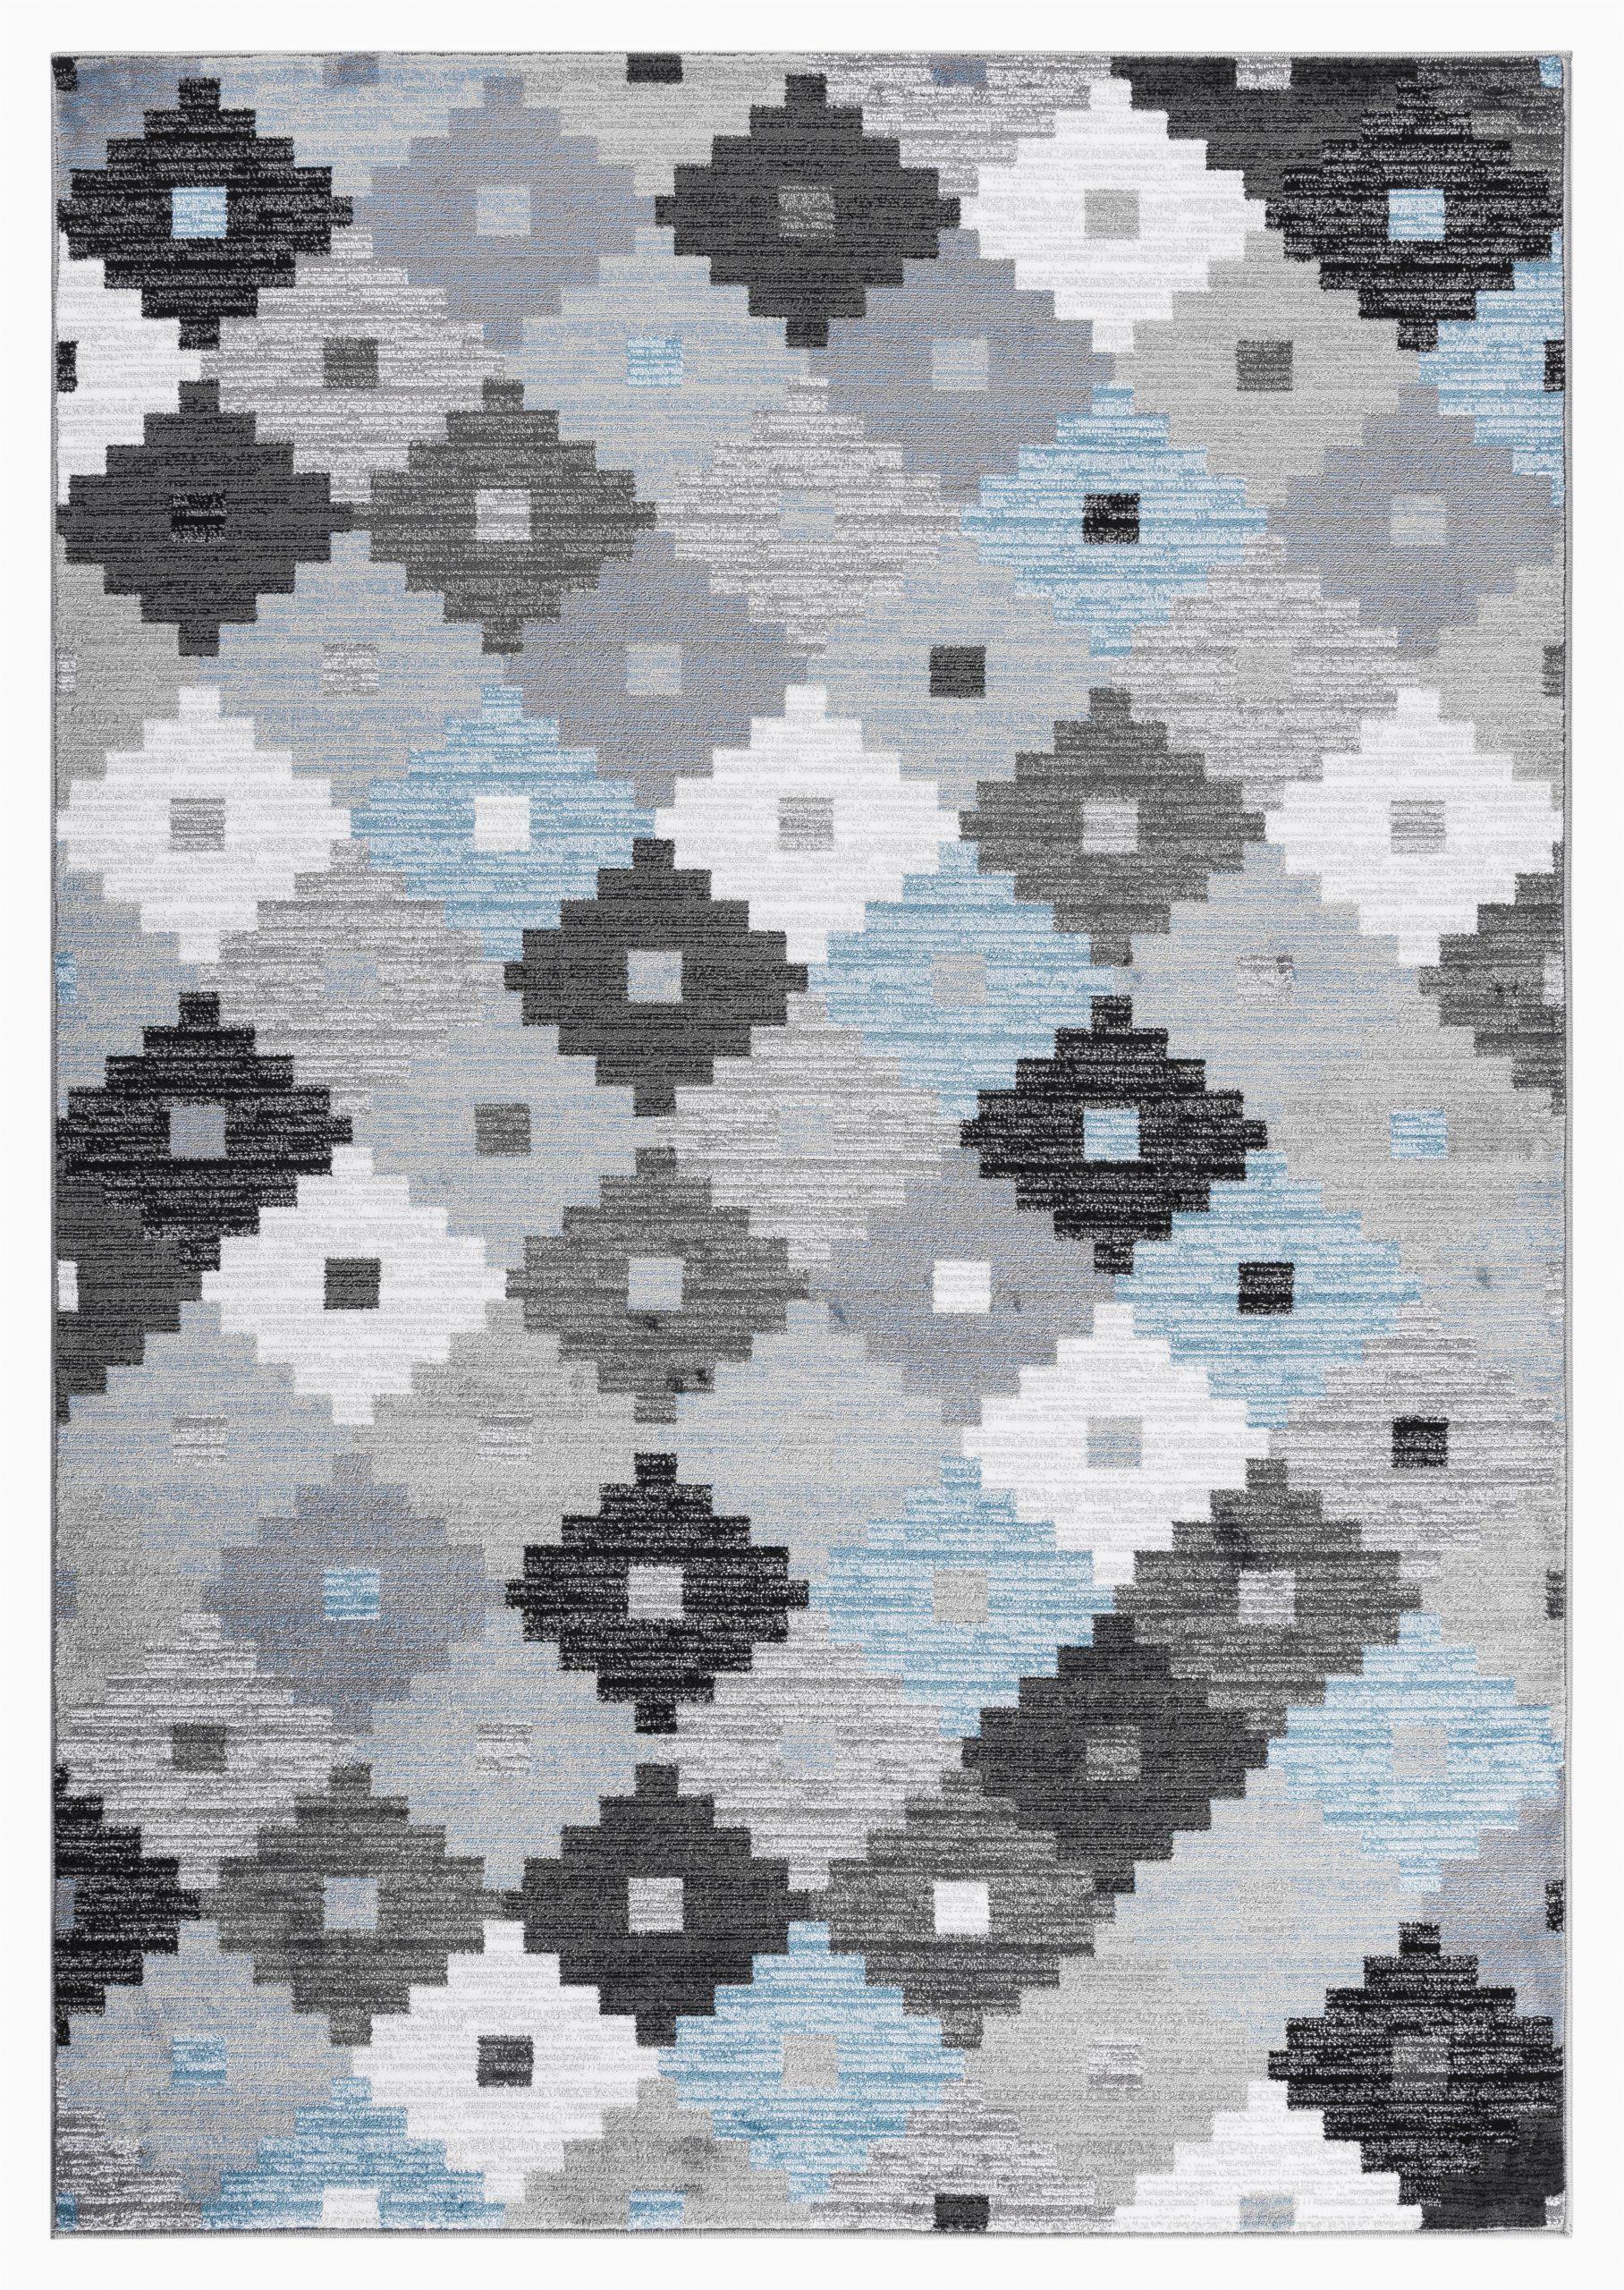 caledian quilt grayblueblack area rug